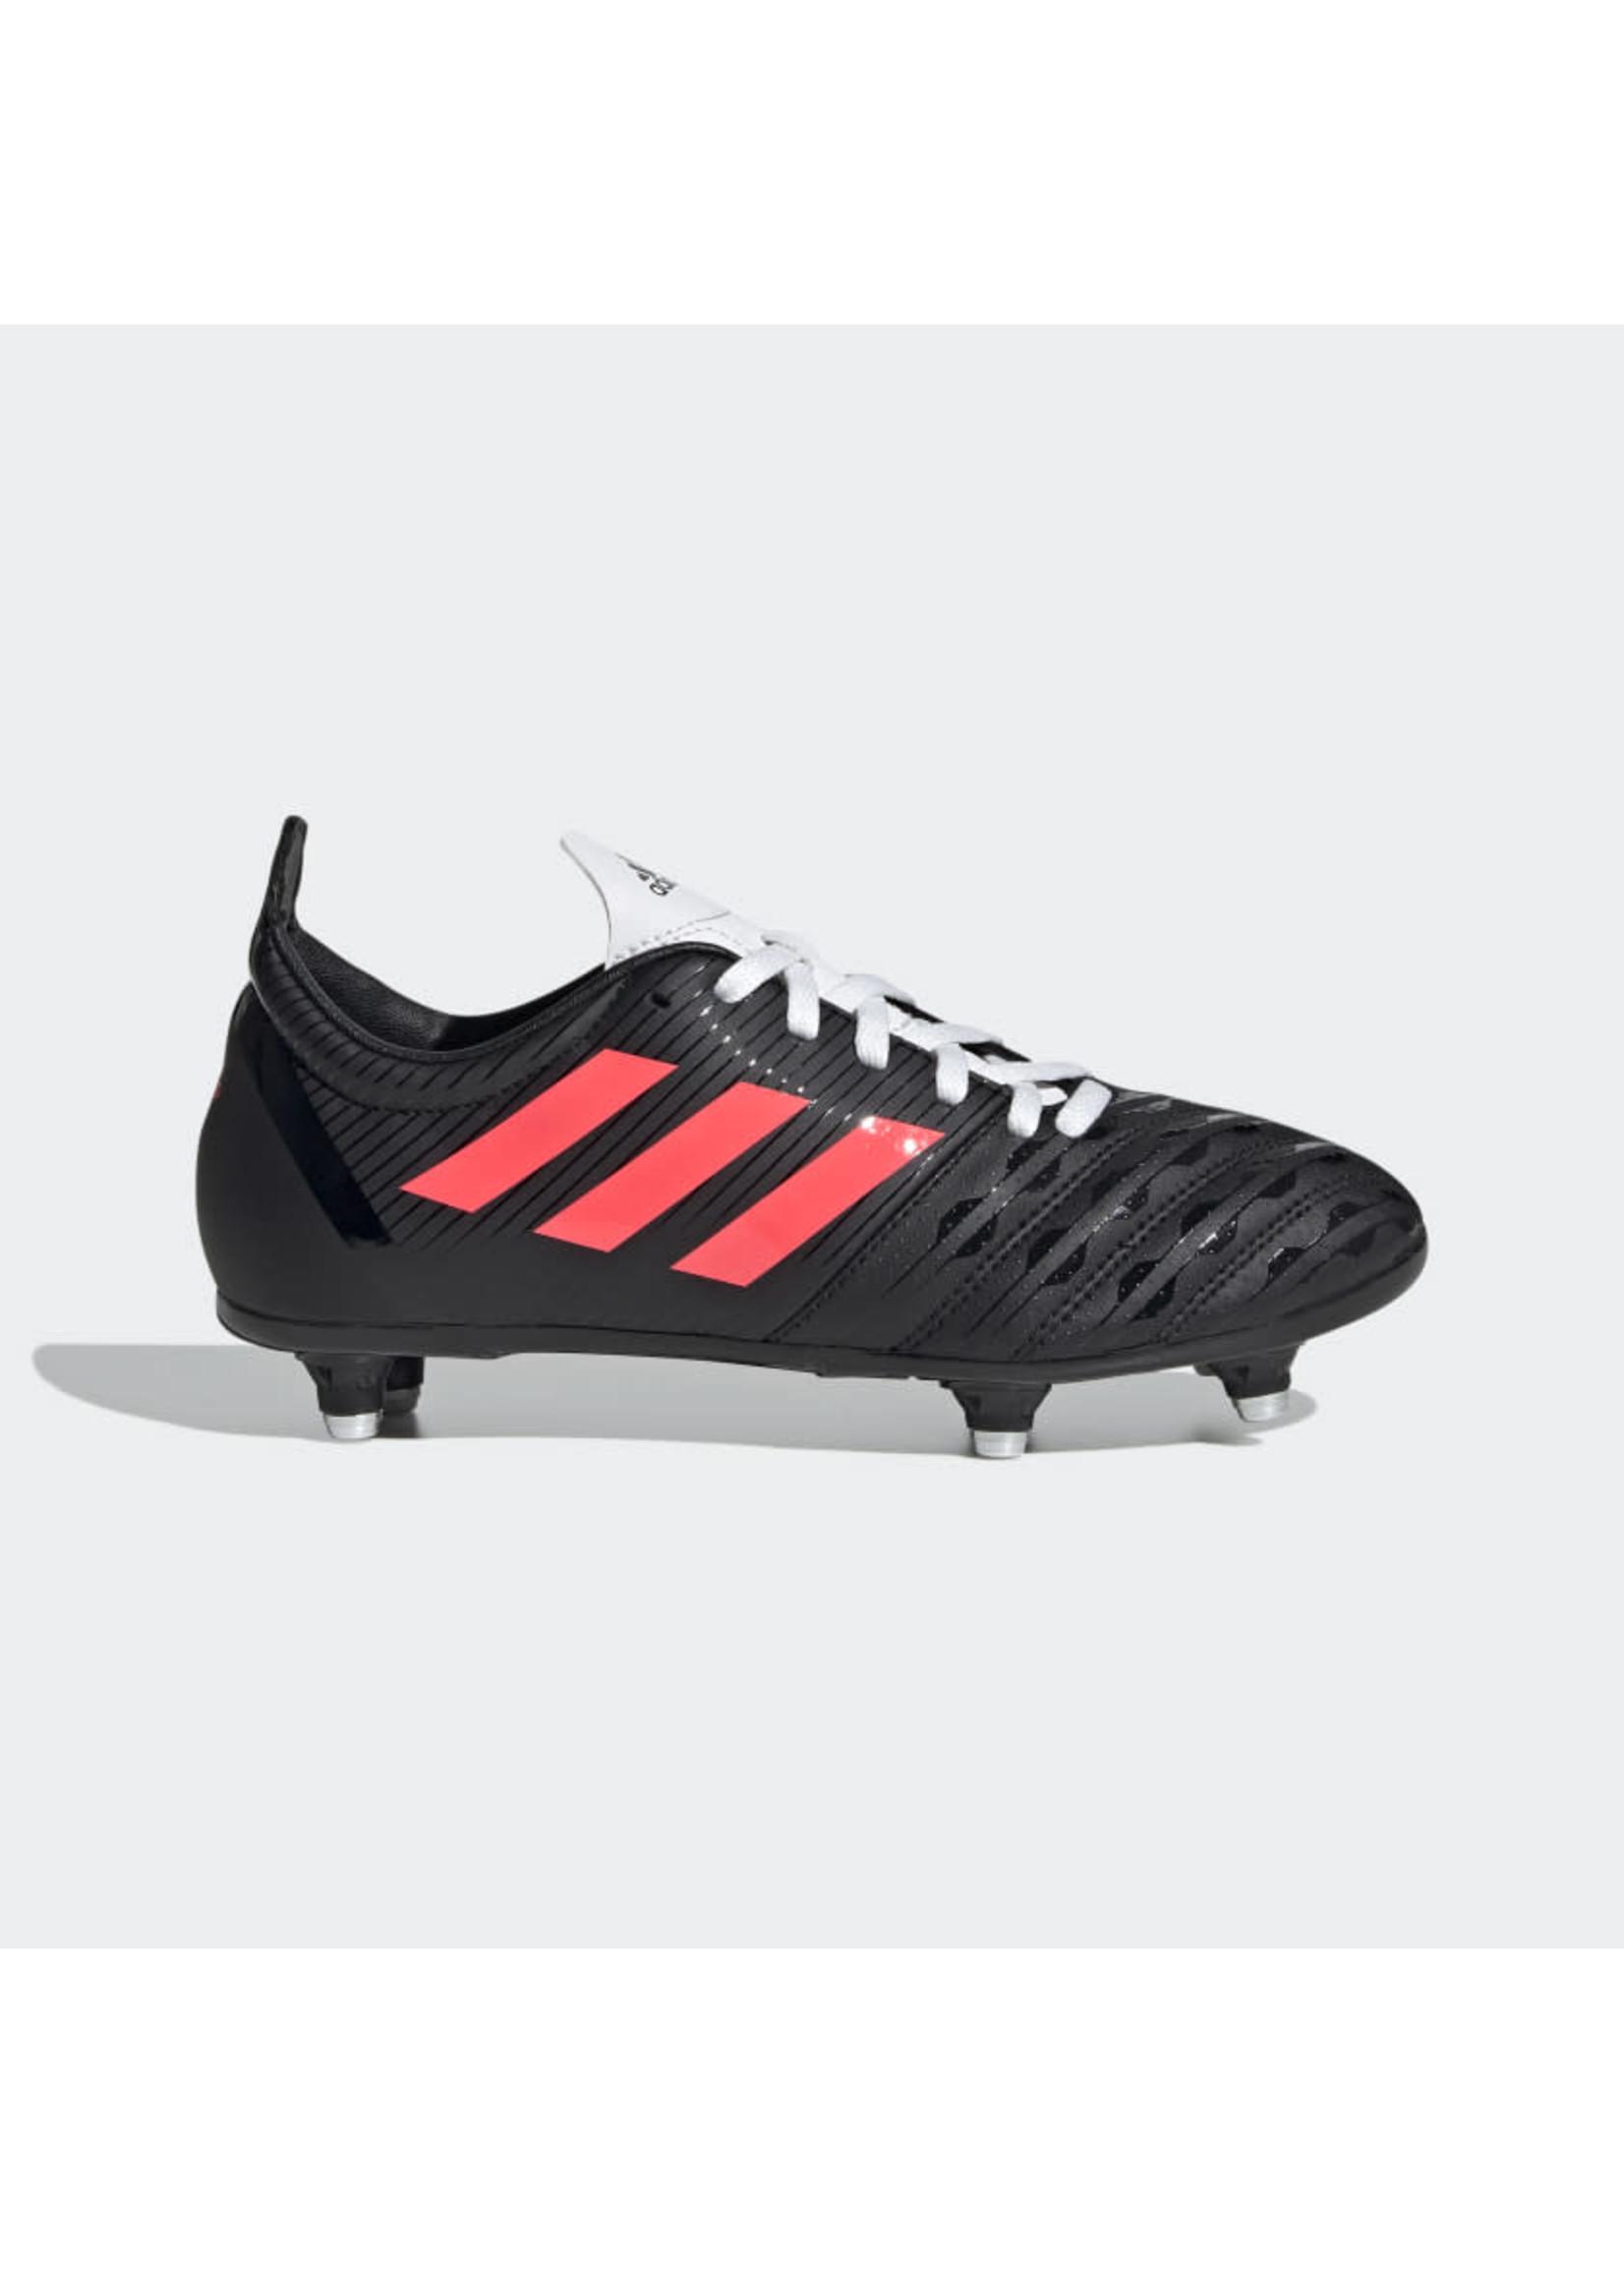 Adidas Adidas Malice Junior Rugby Boots - SG (2021)